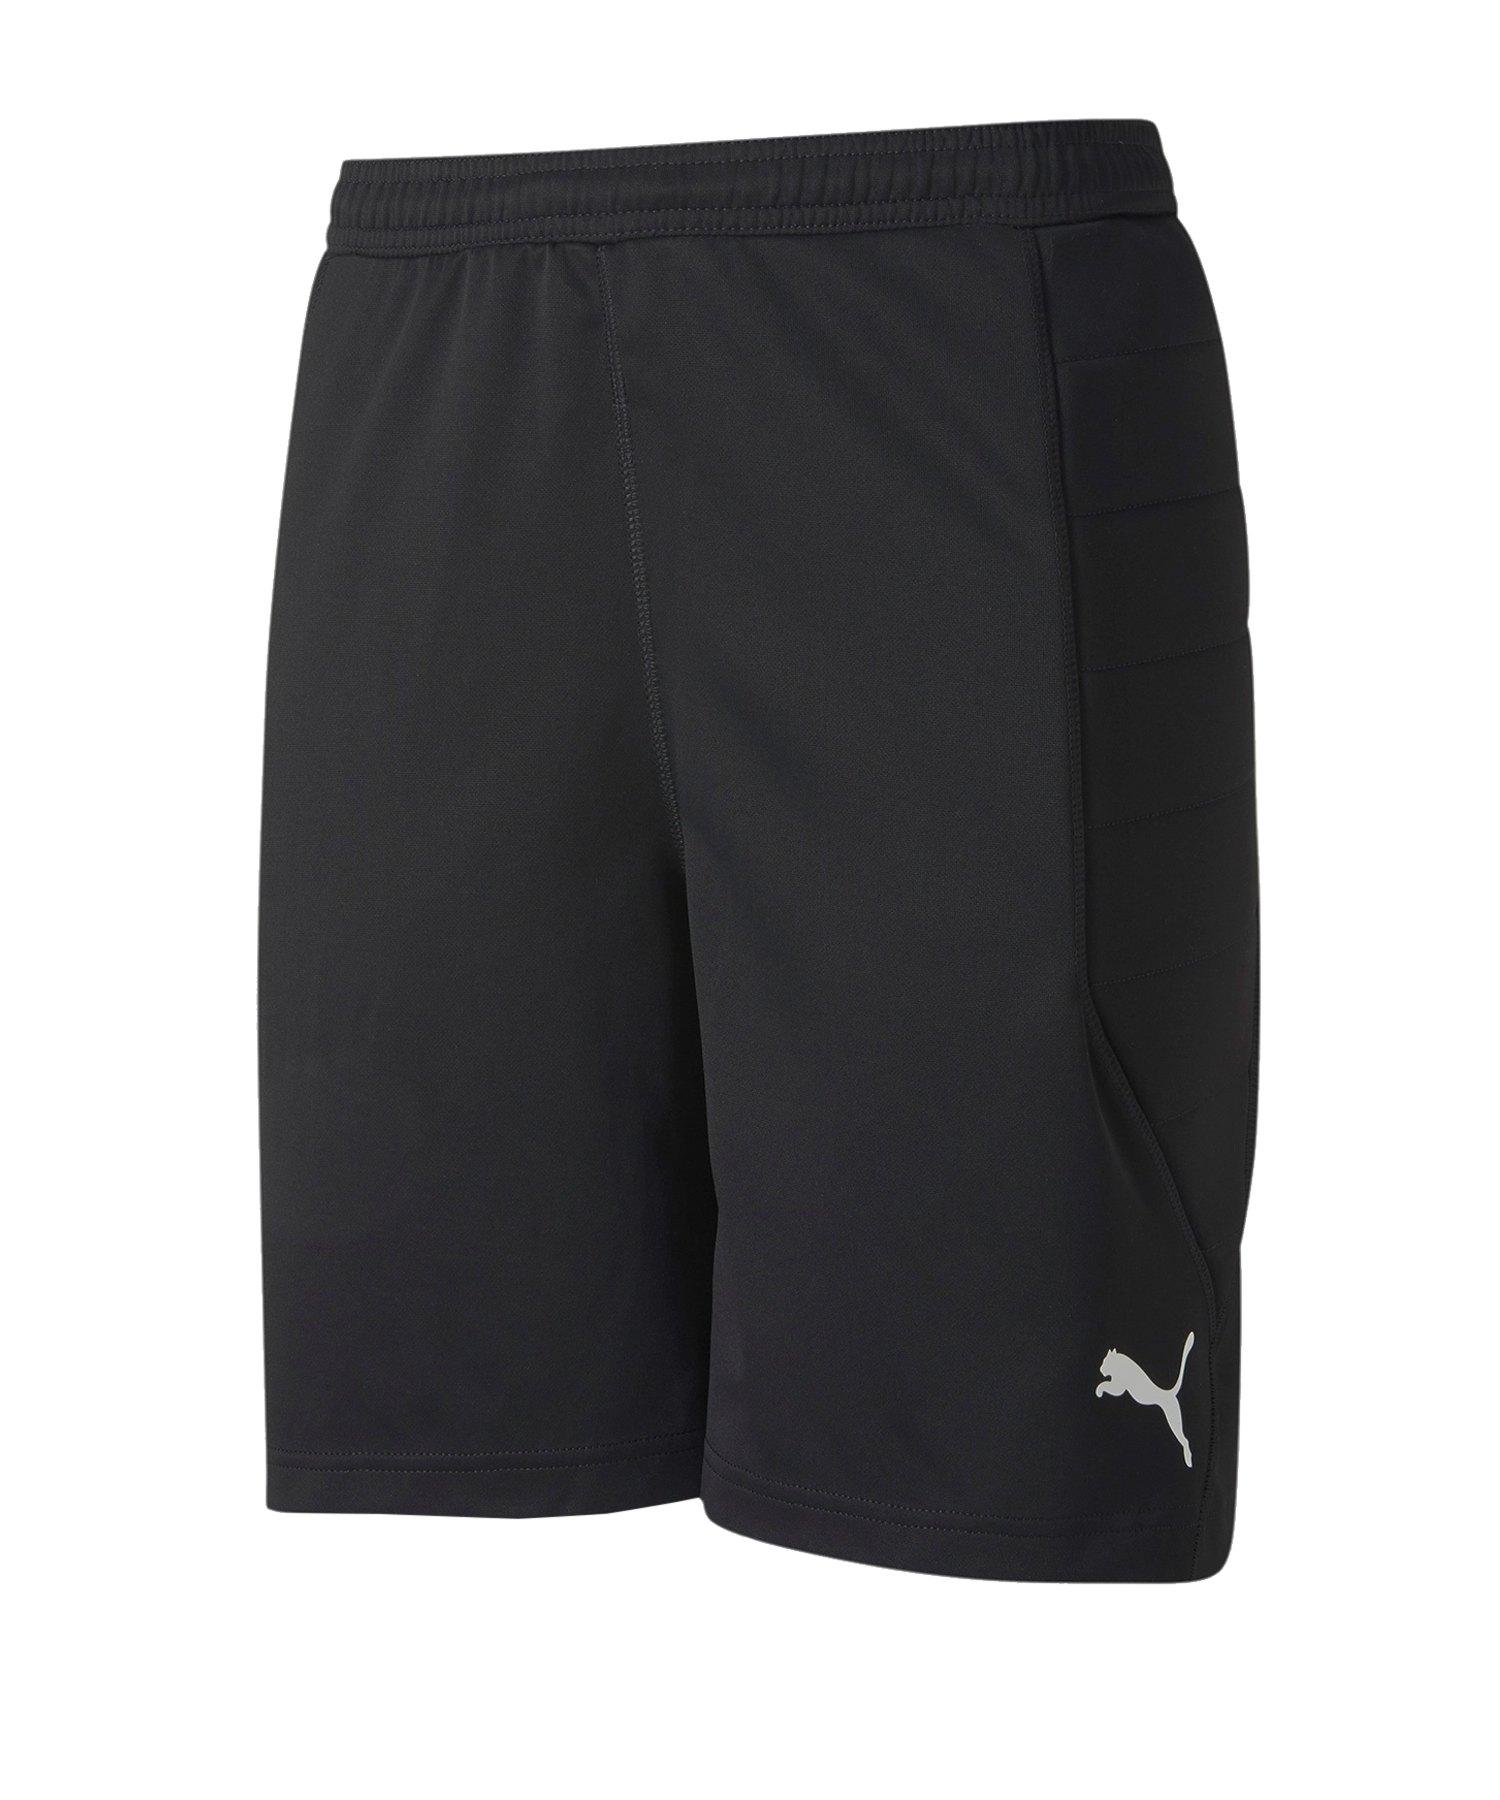 PUMA Goalkeeper Short Torwartshort Schwarz F01 - schwarz